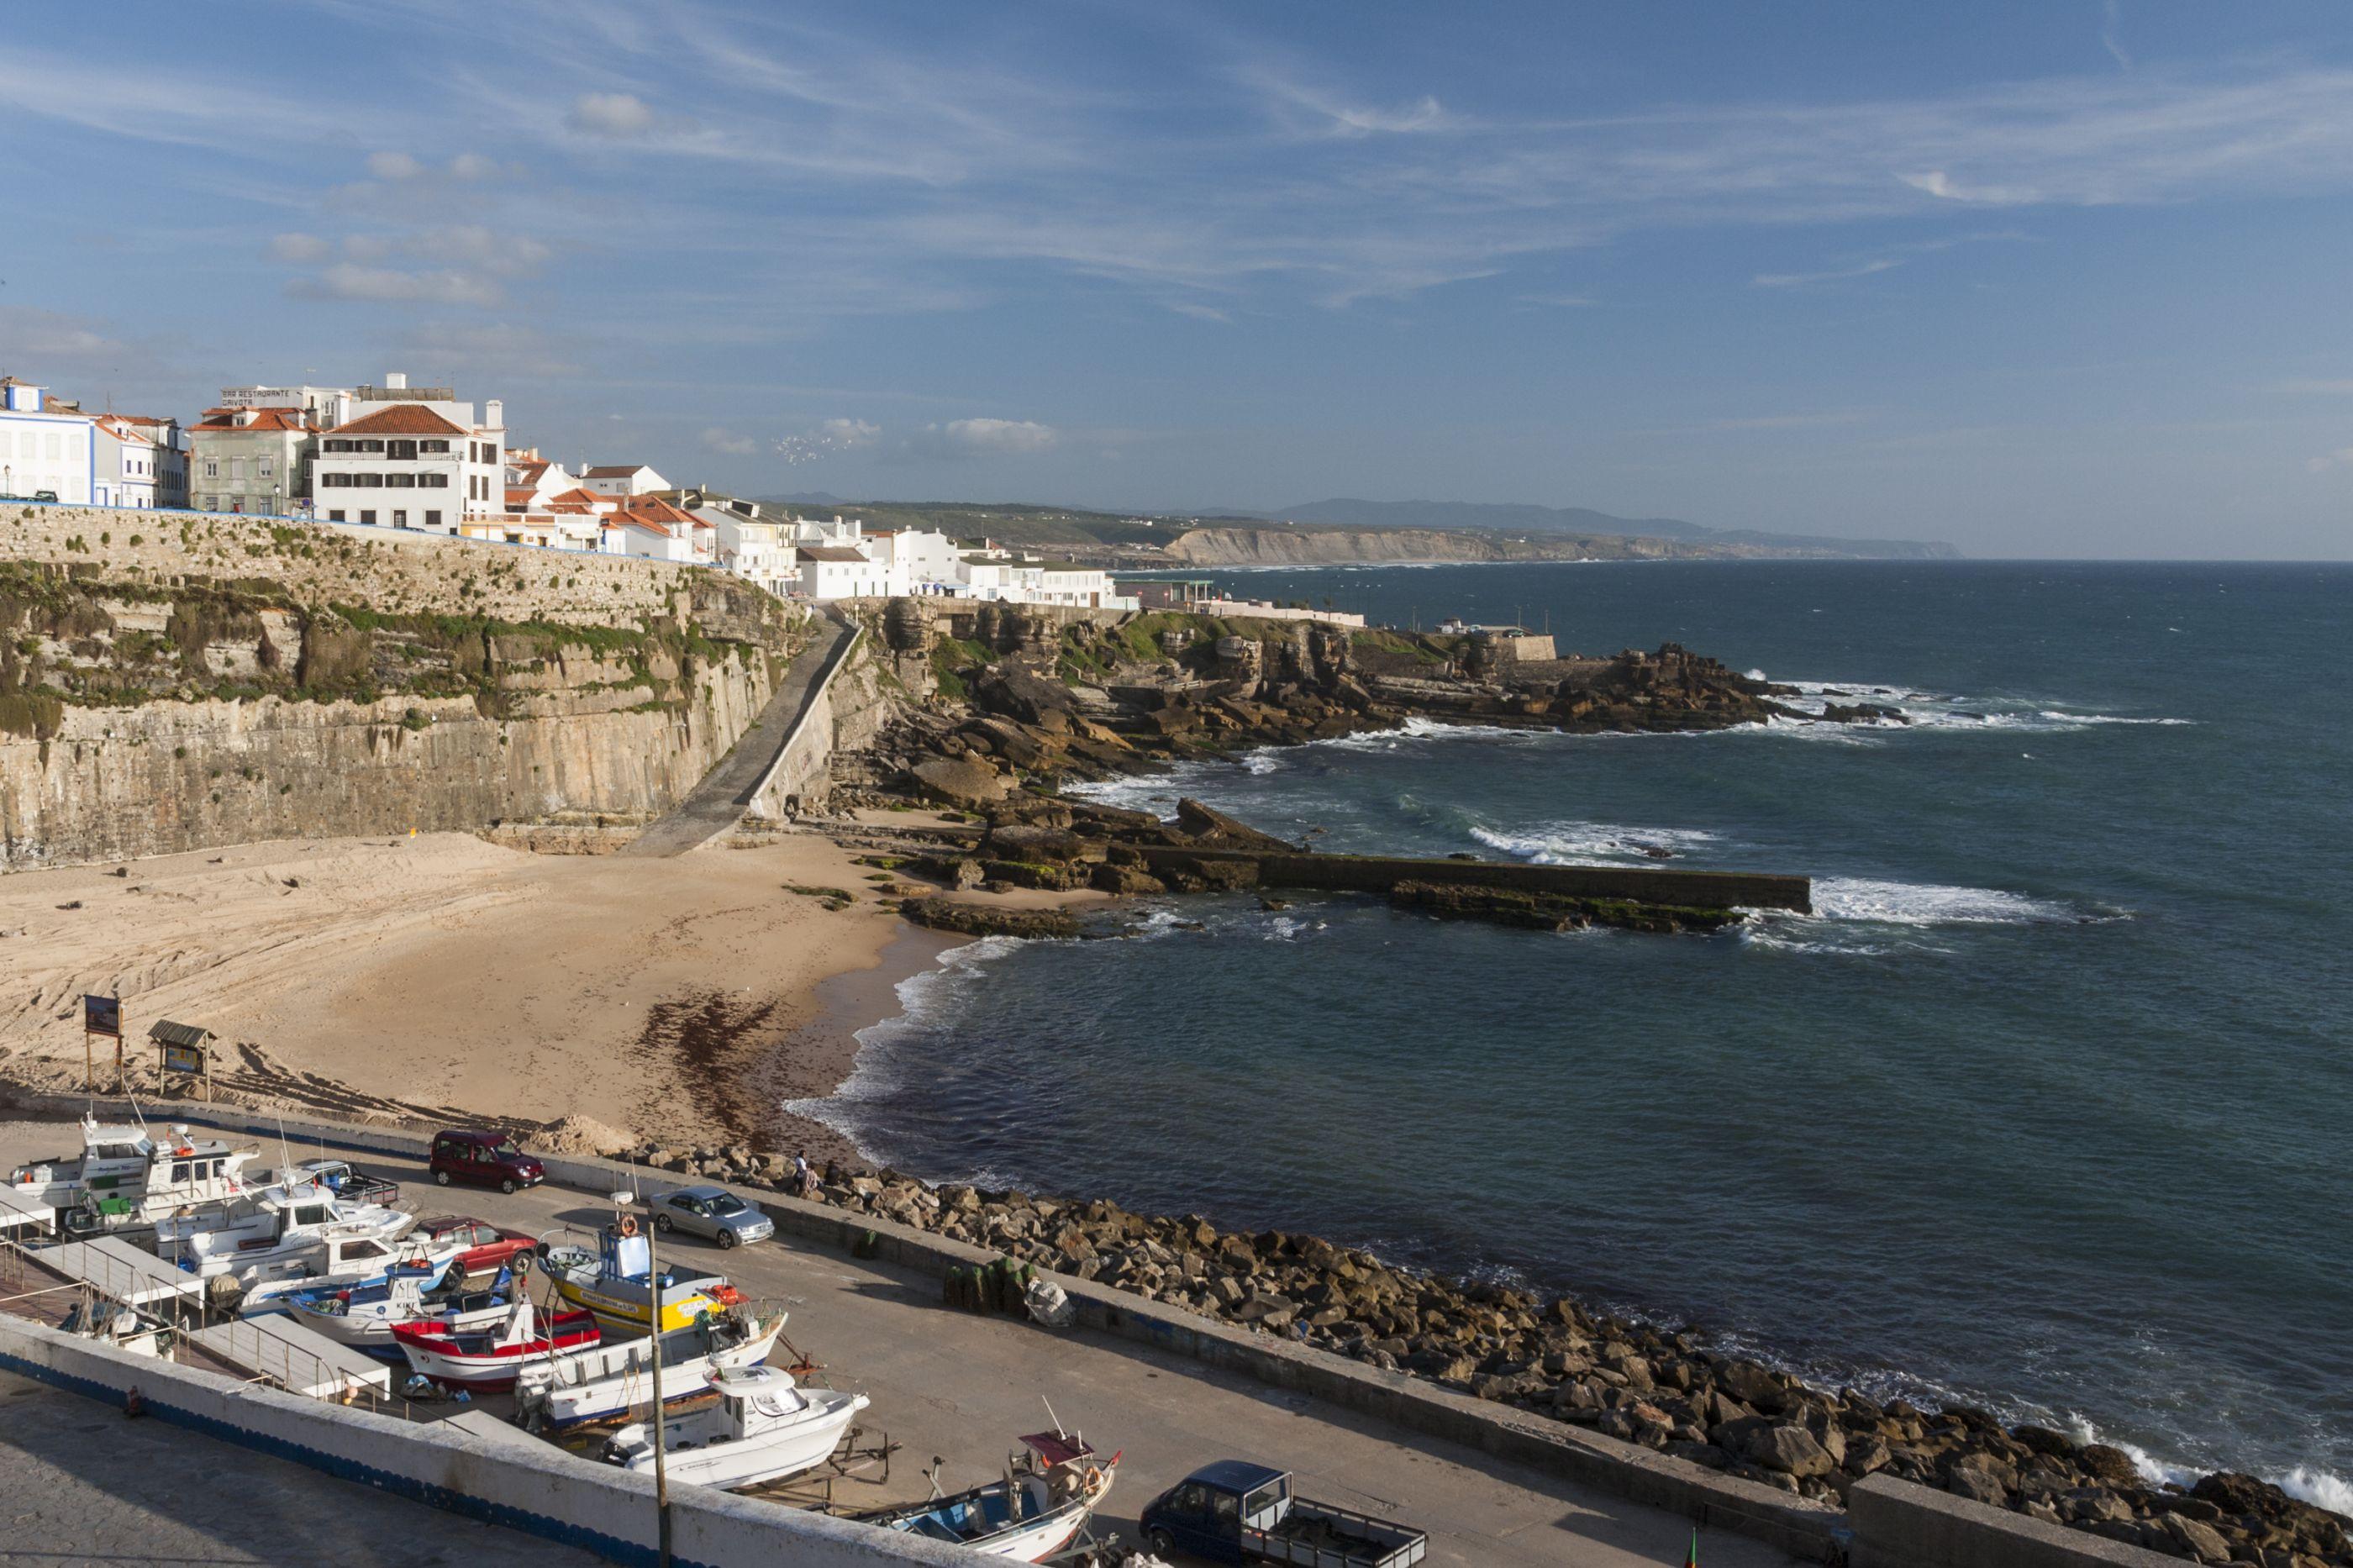 Surf Summit arranca hoje na Ericeira pelo 3.º ano consecutivo